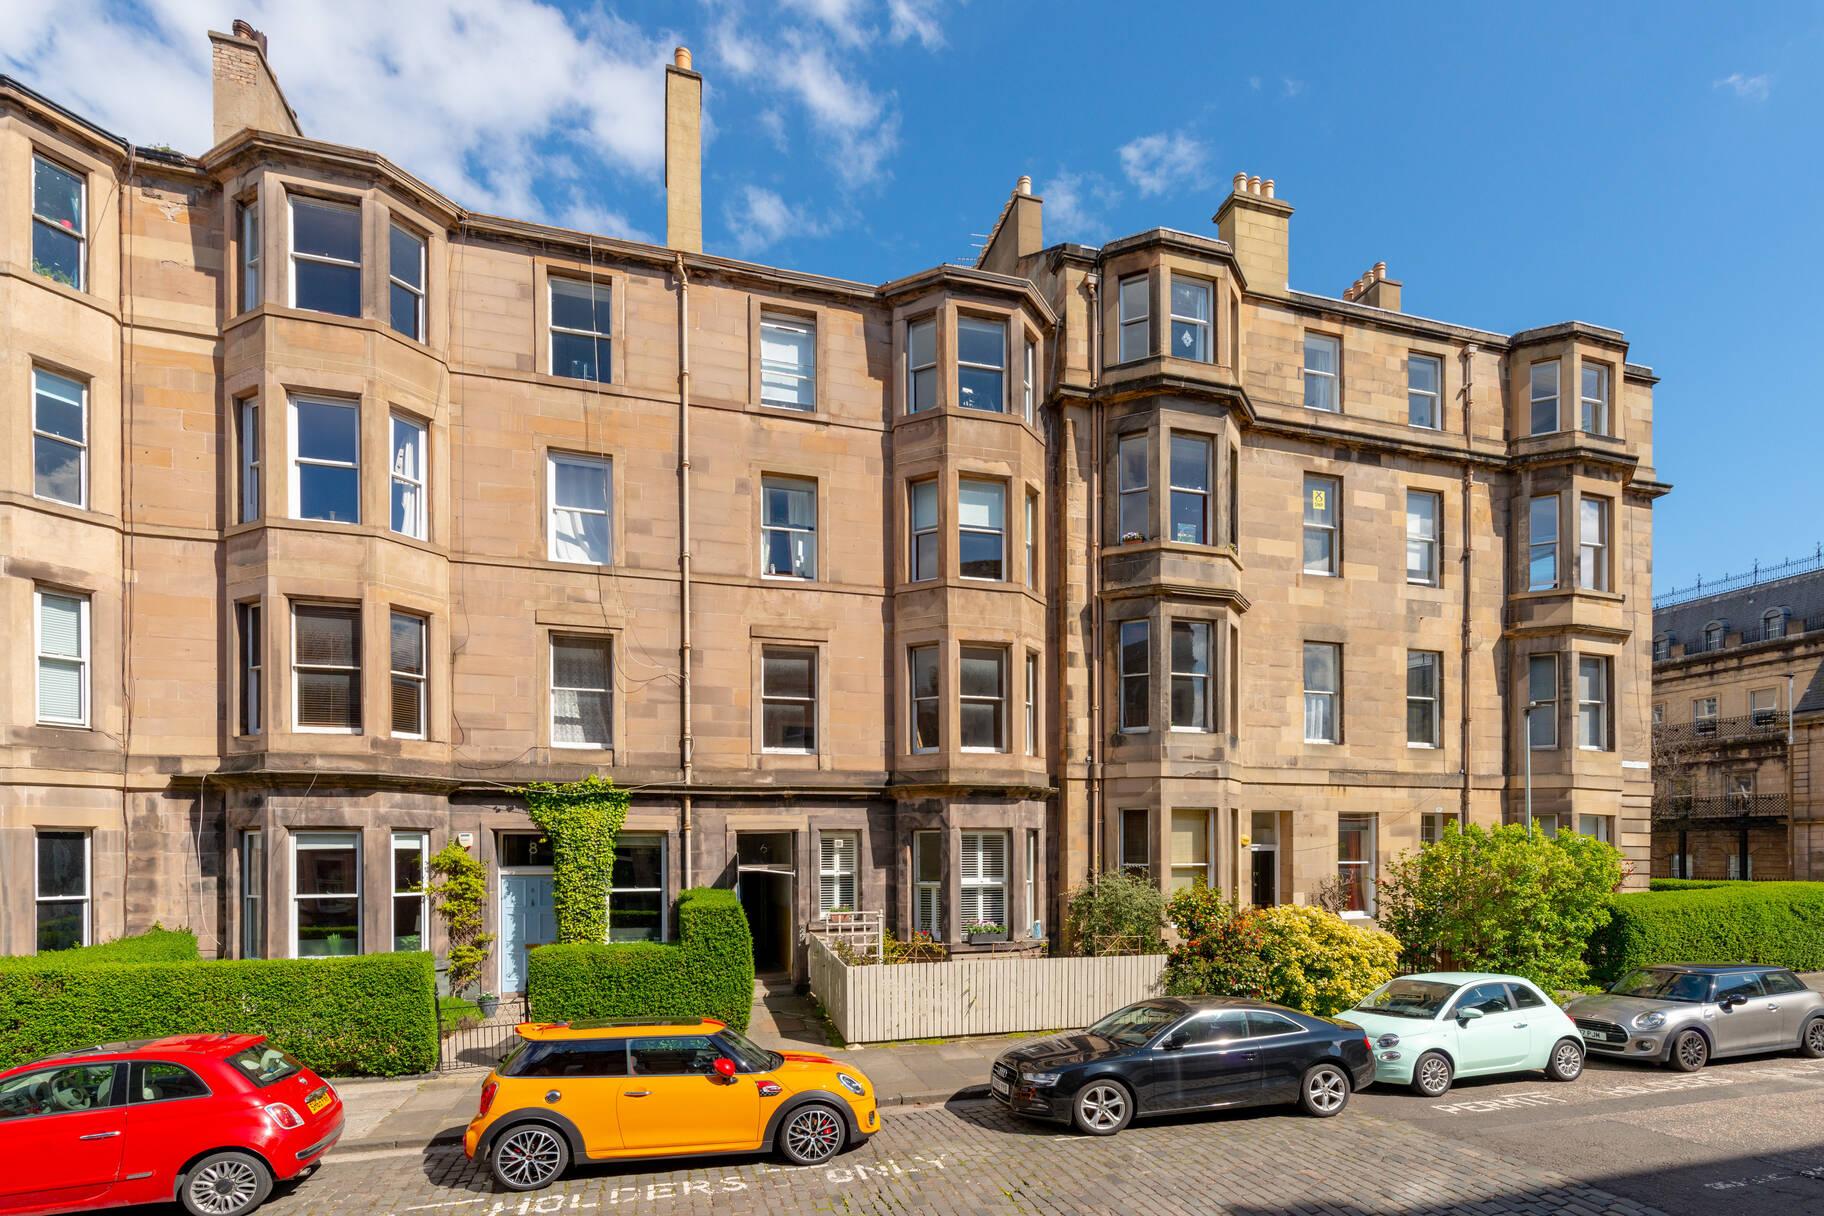 6/1 Perth Street, New Town, Edinburgh, EH3 5DP